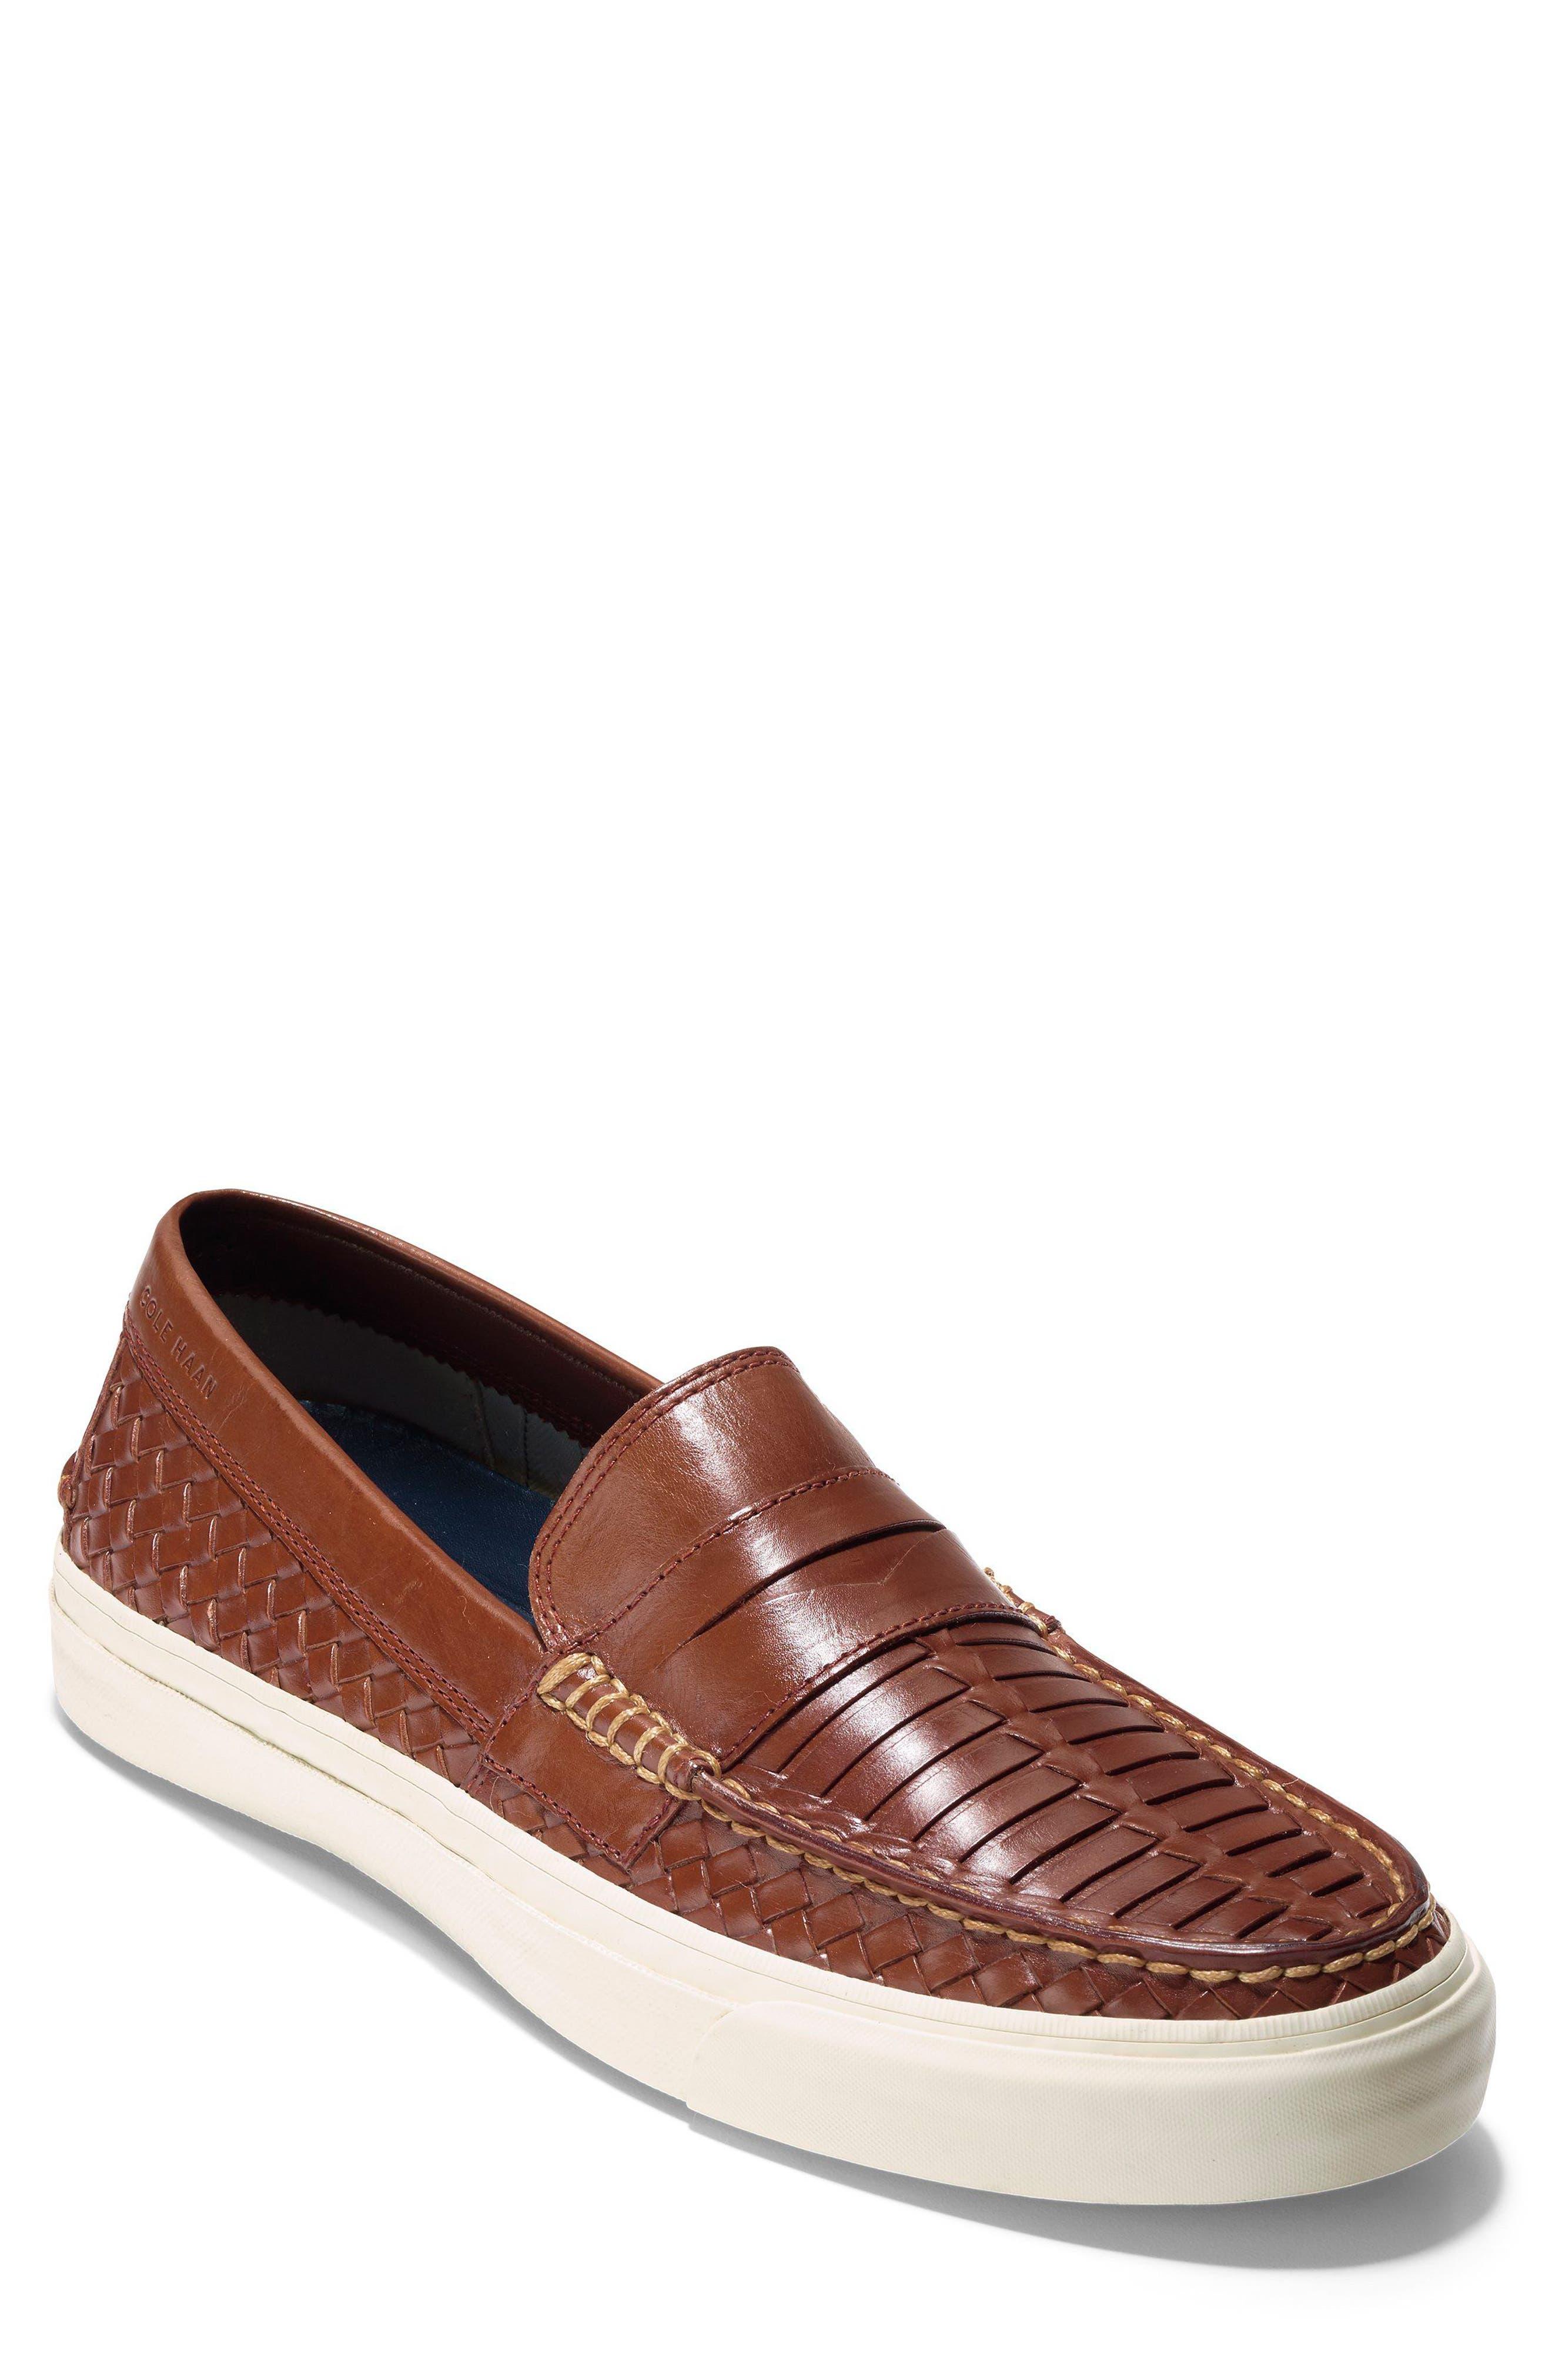 Pinch Weekend LX Huarache Loafer,                         Main,                         color, Woodbury Woven Burnish